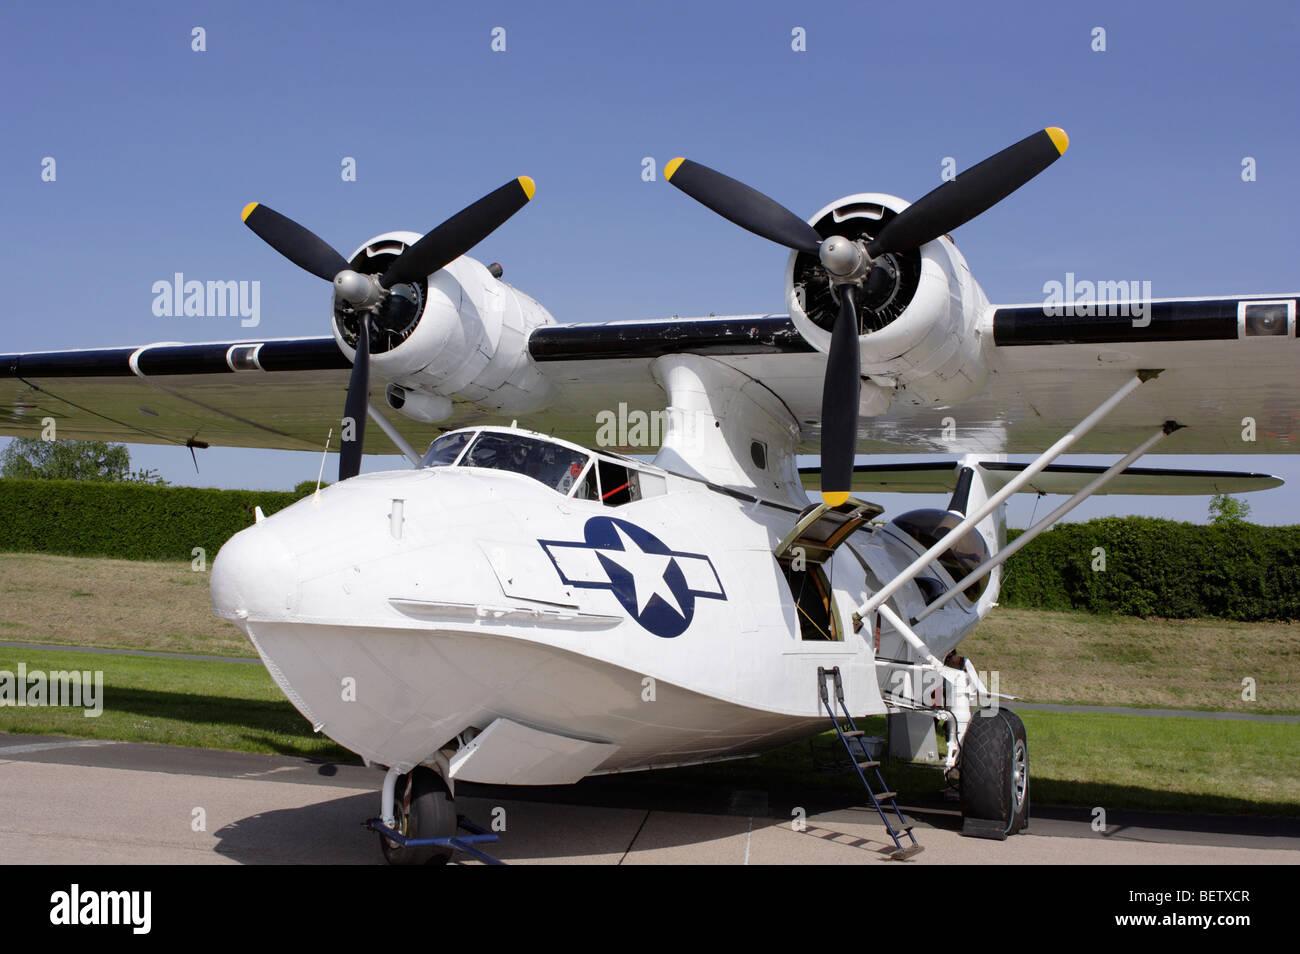 PBY Catalina airplane airship aircraft plane - Stock Image